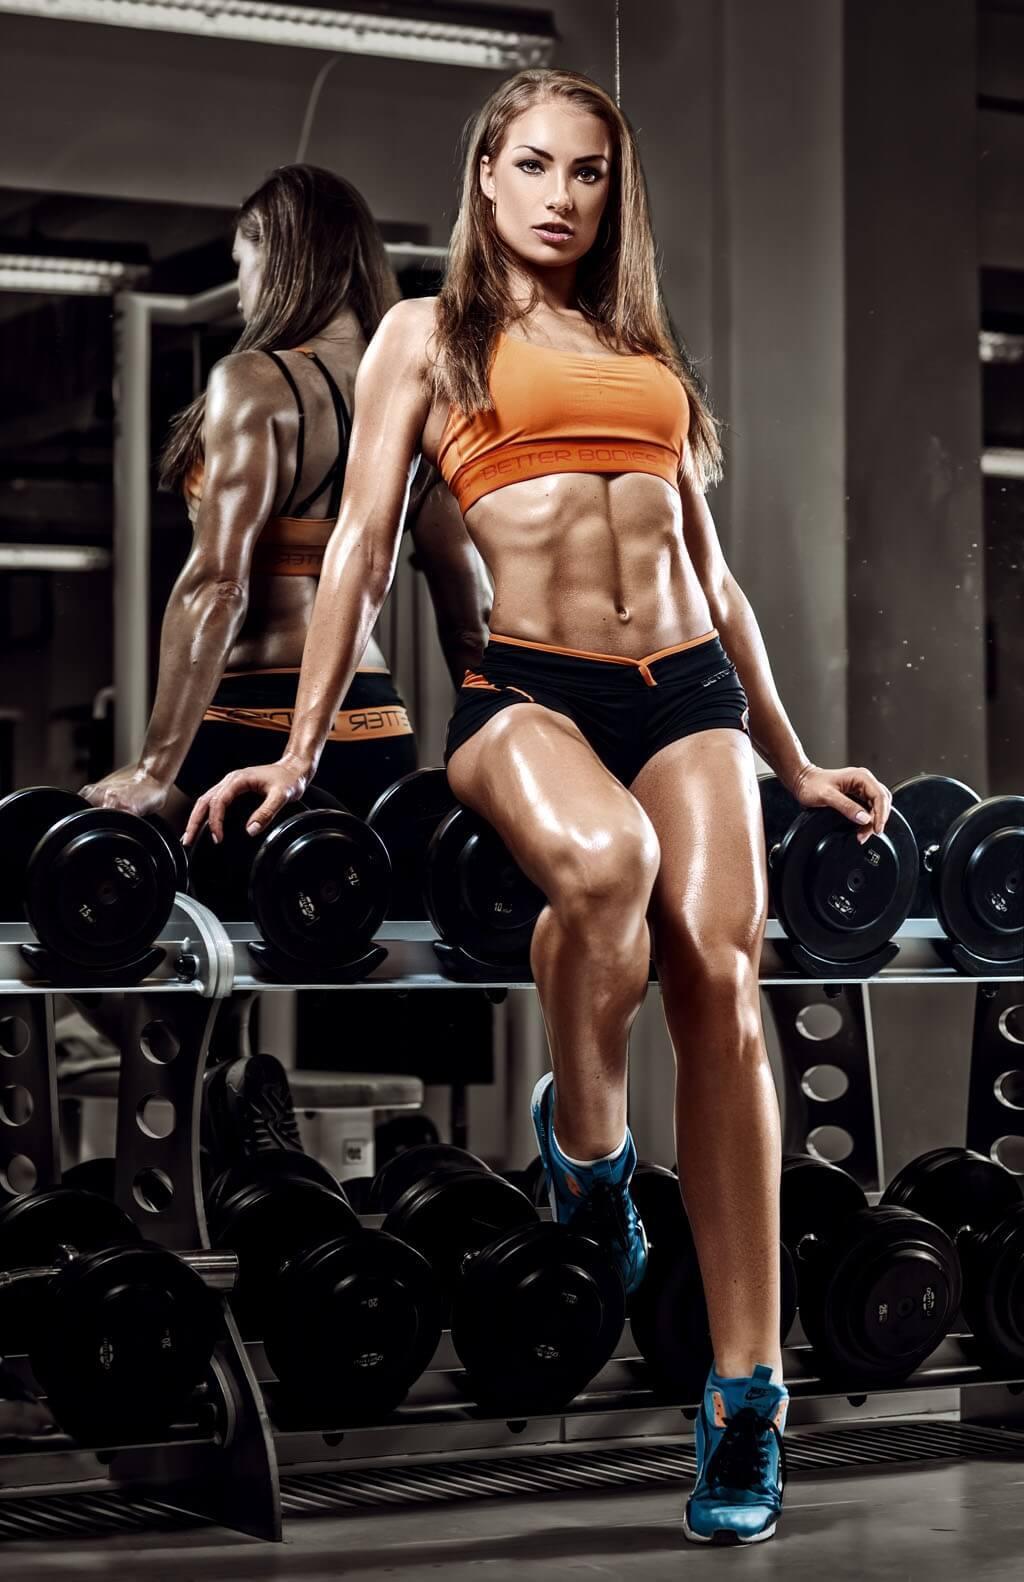 Girl gym This Girls